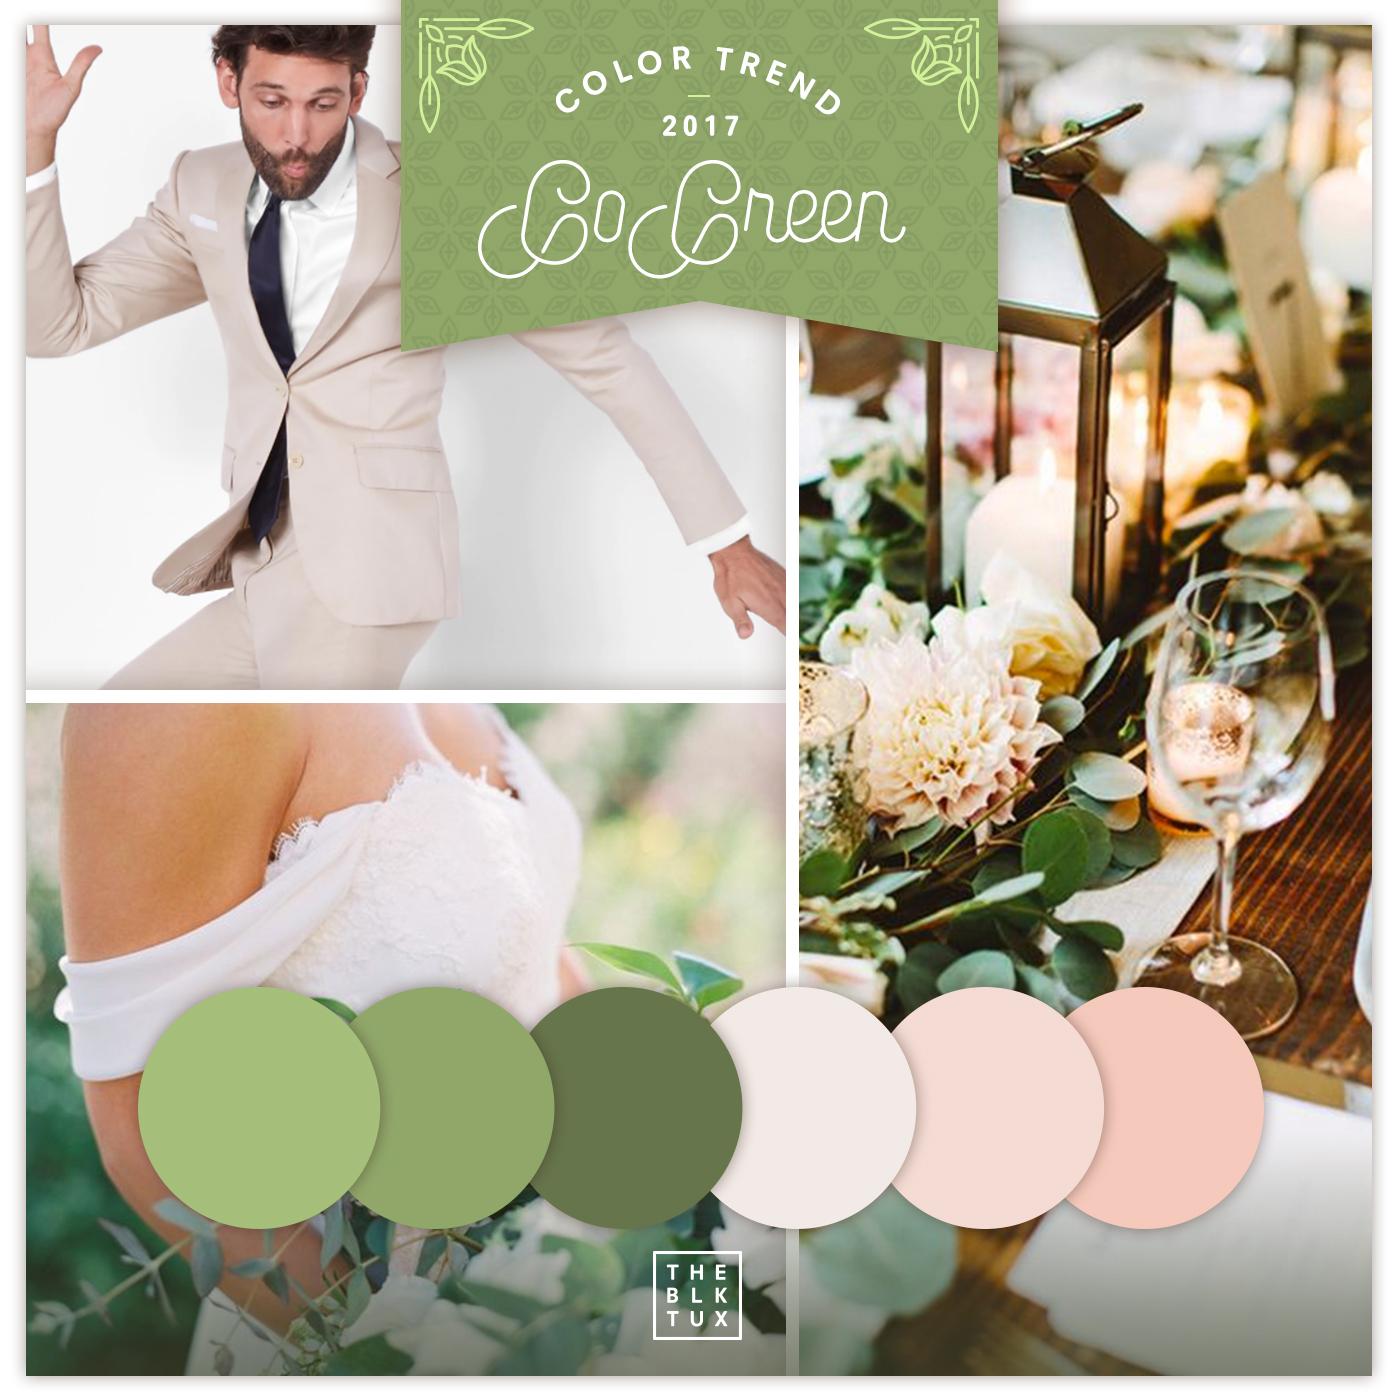 blktux_wedding_color_trends_green_x2_v02.jpg